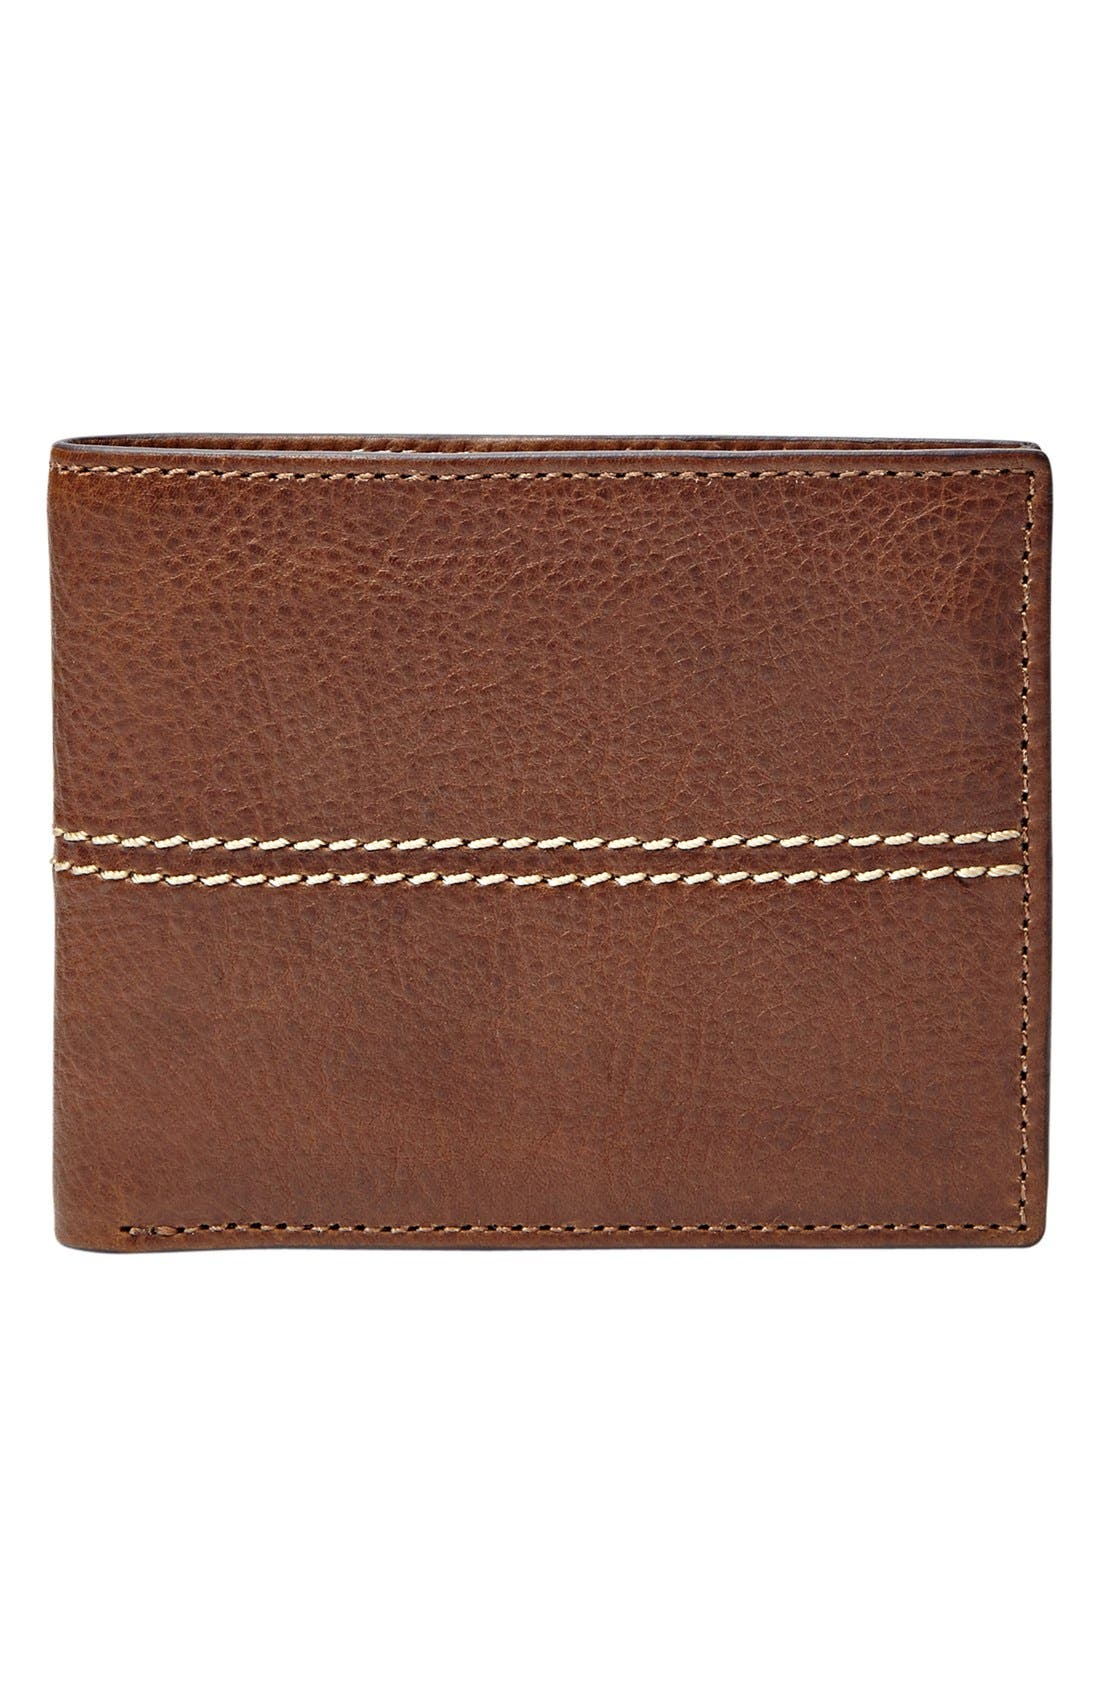 Main Image - Fossil 'Turk' Leather RFID Wallet